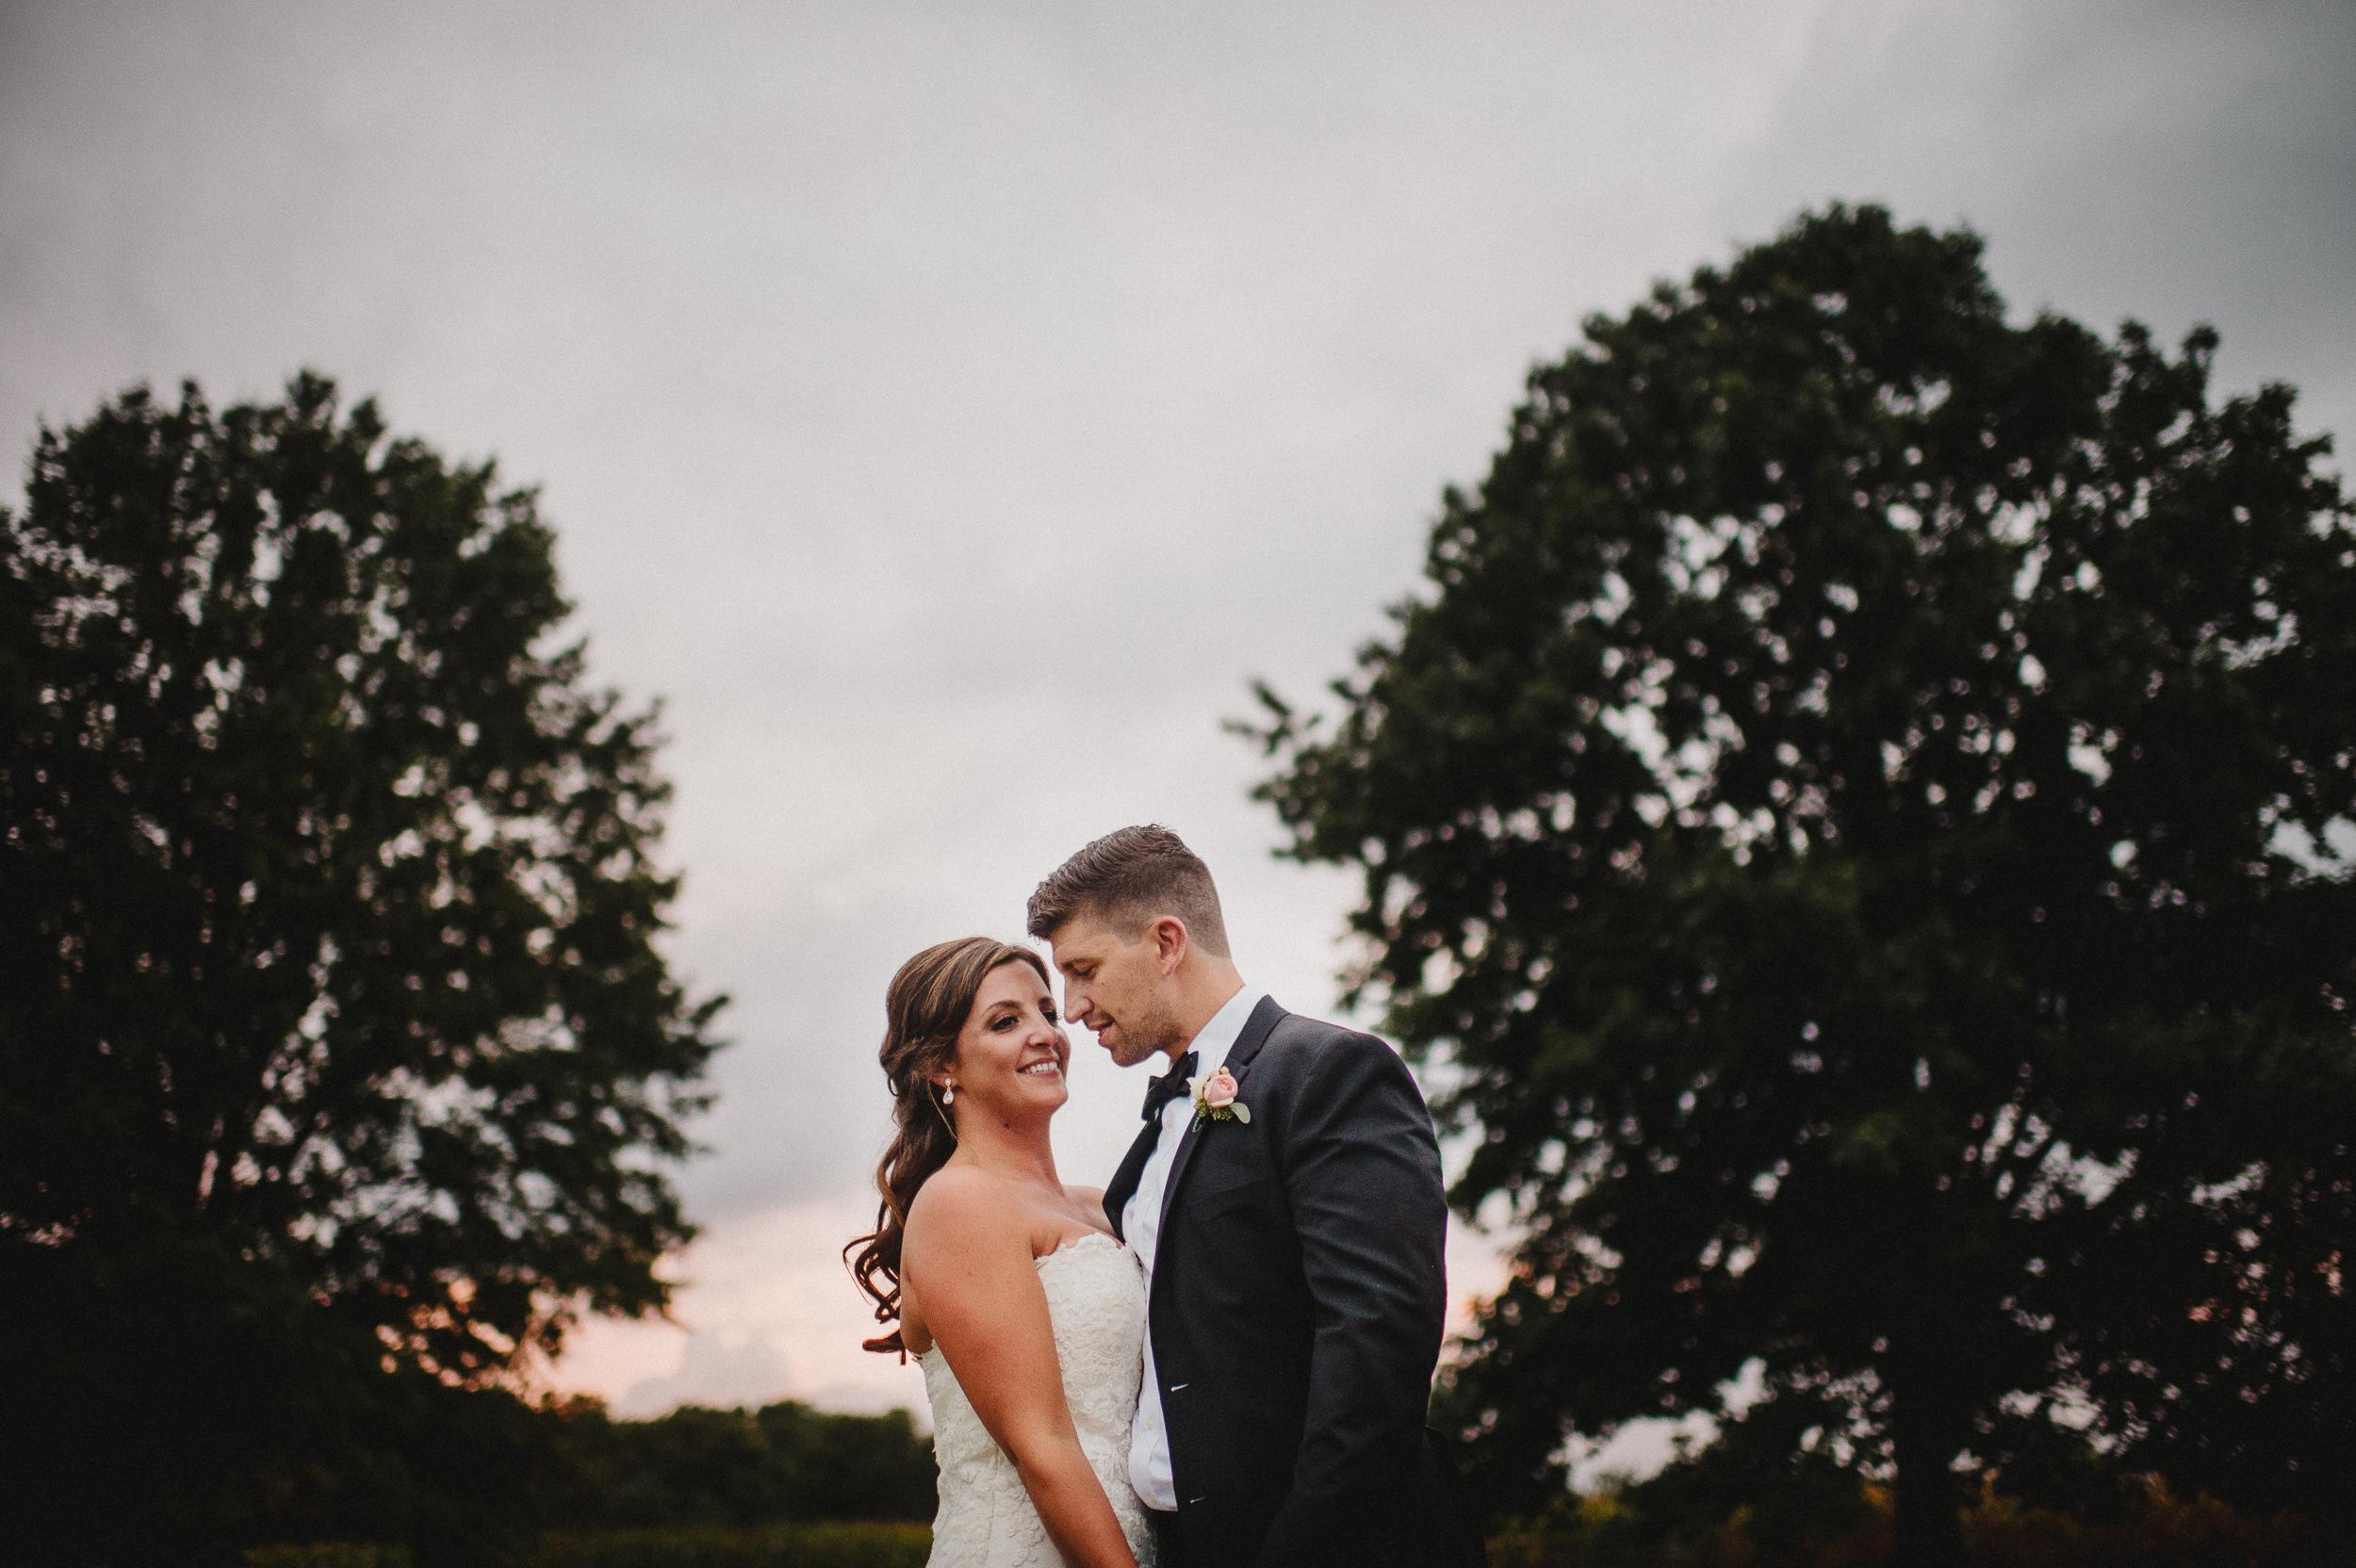 delaware-estate-wedding-photographer-pat-robinson-photography-102.jpg